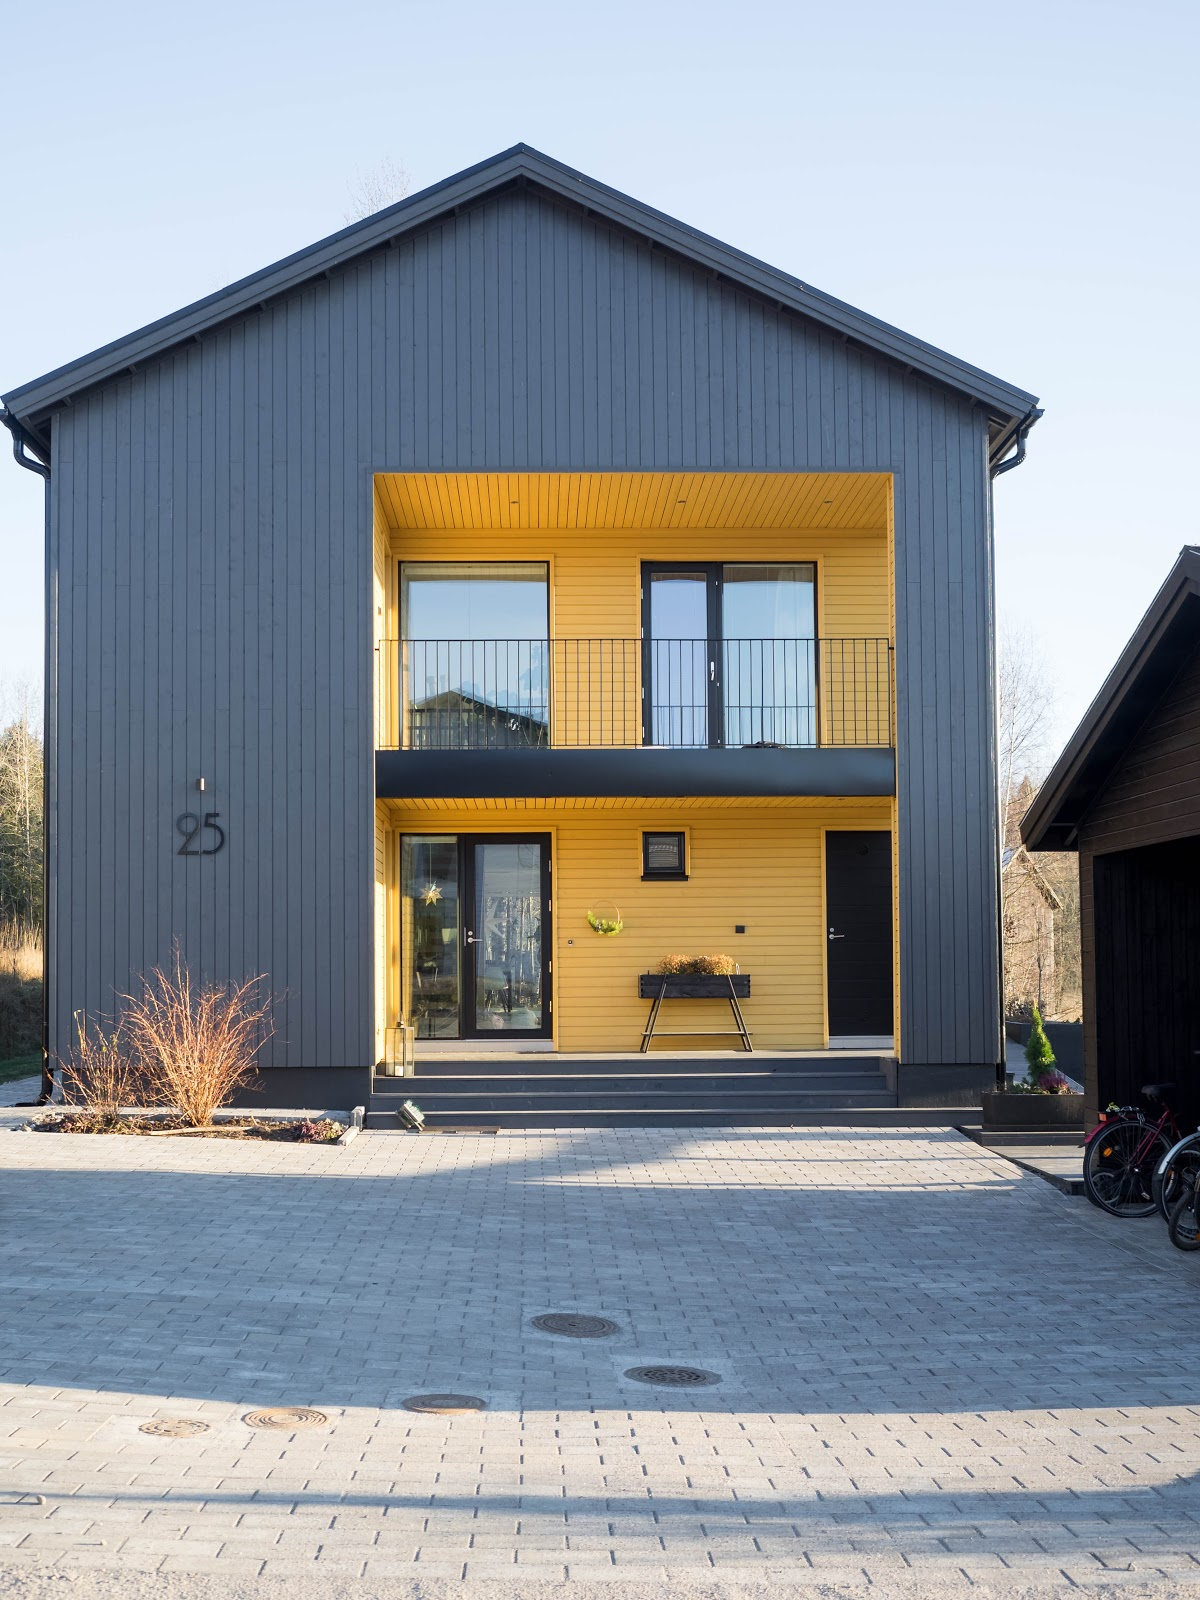 Suomen kaunein koti finalisti Porvoo